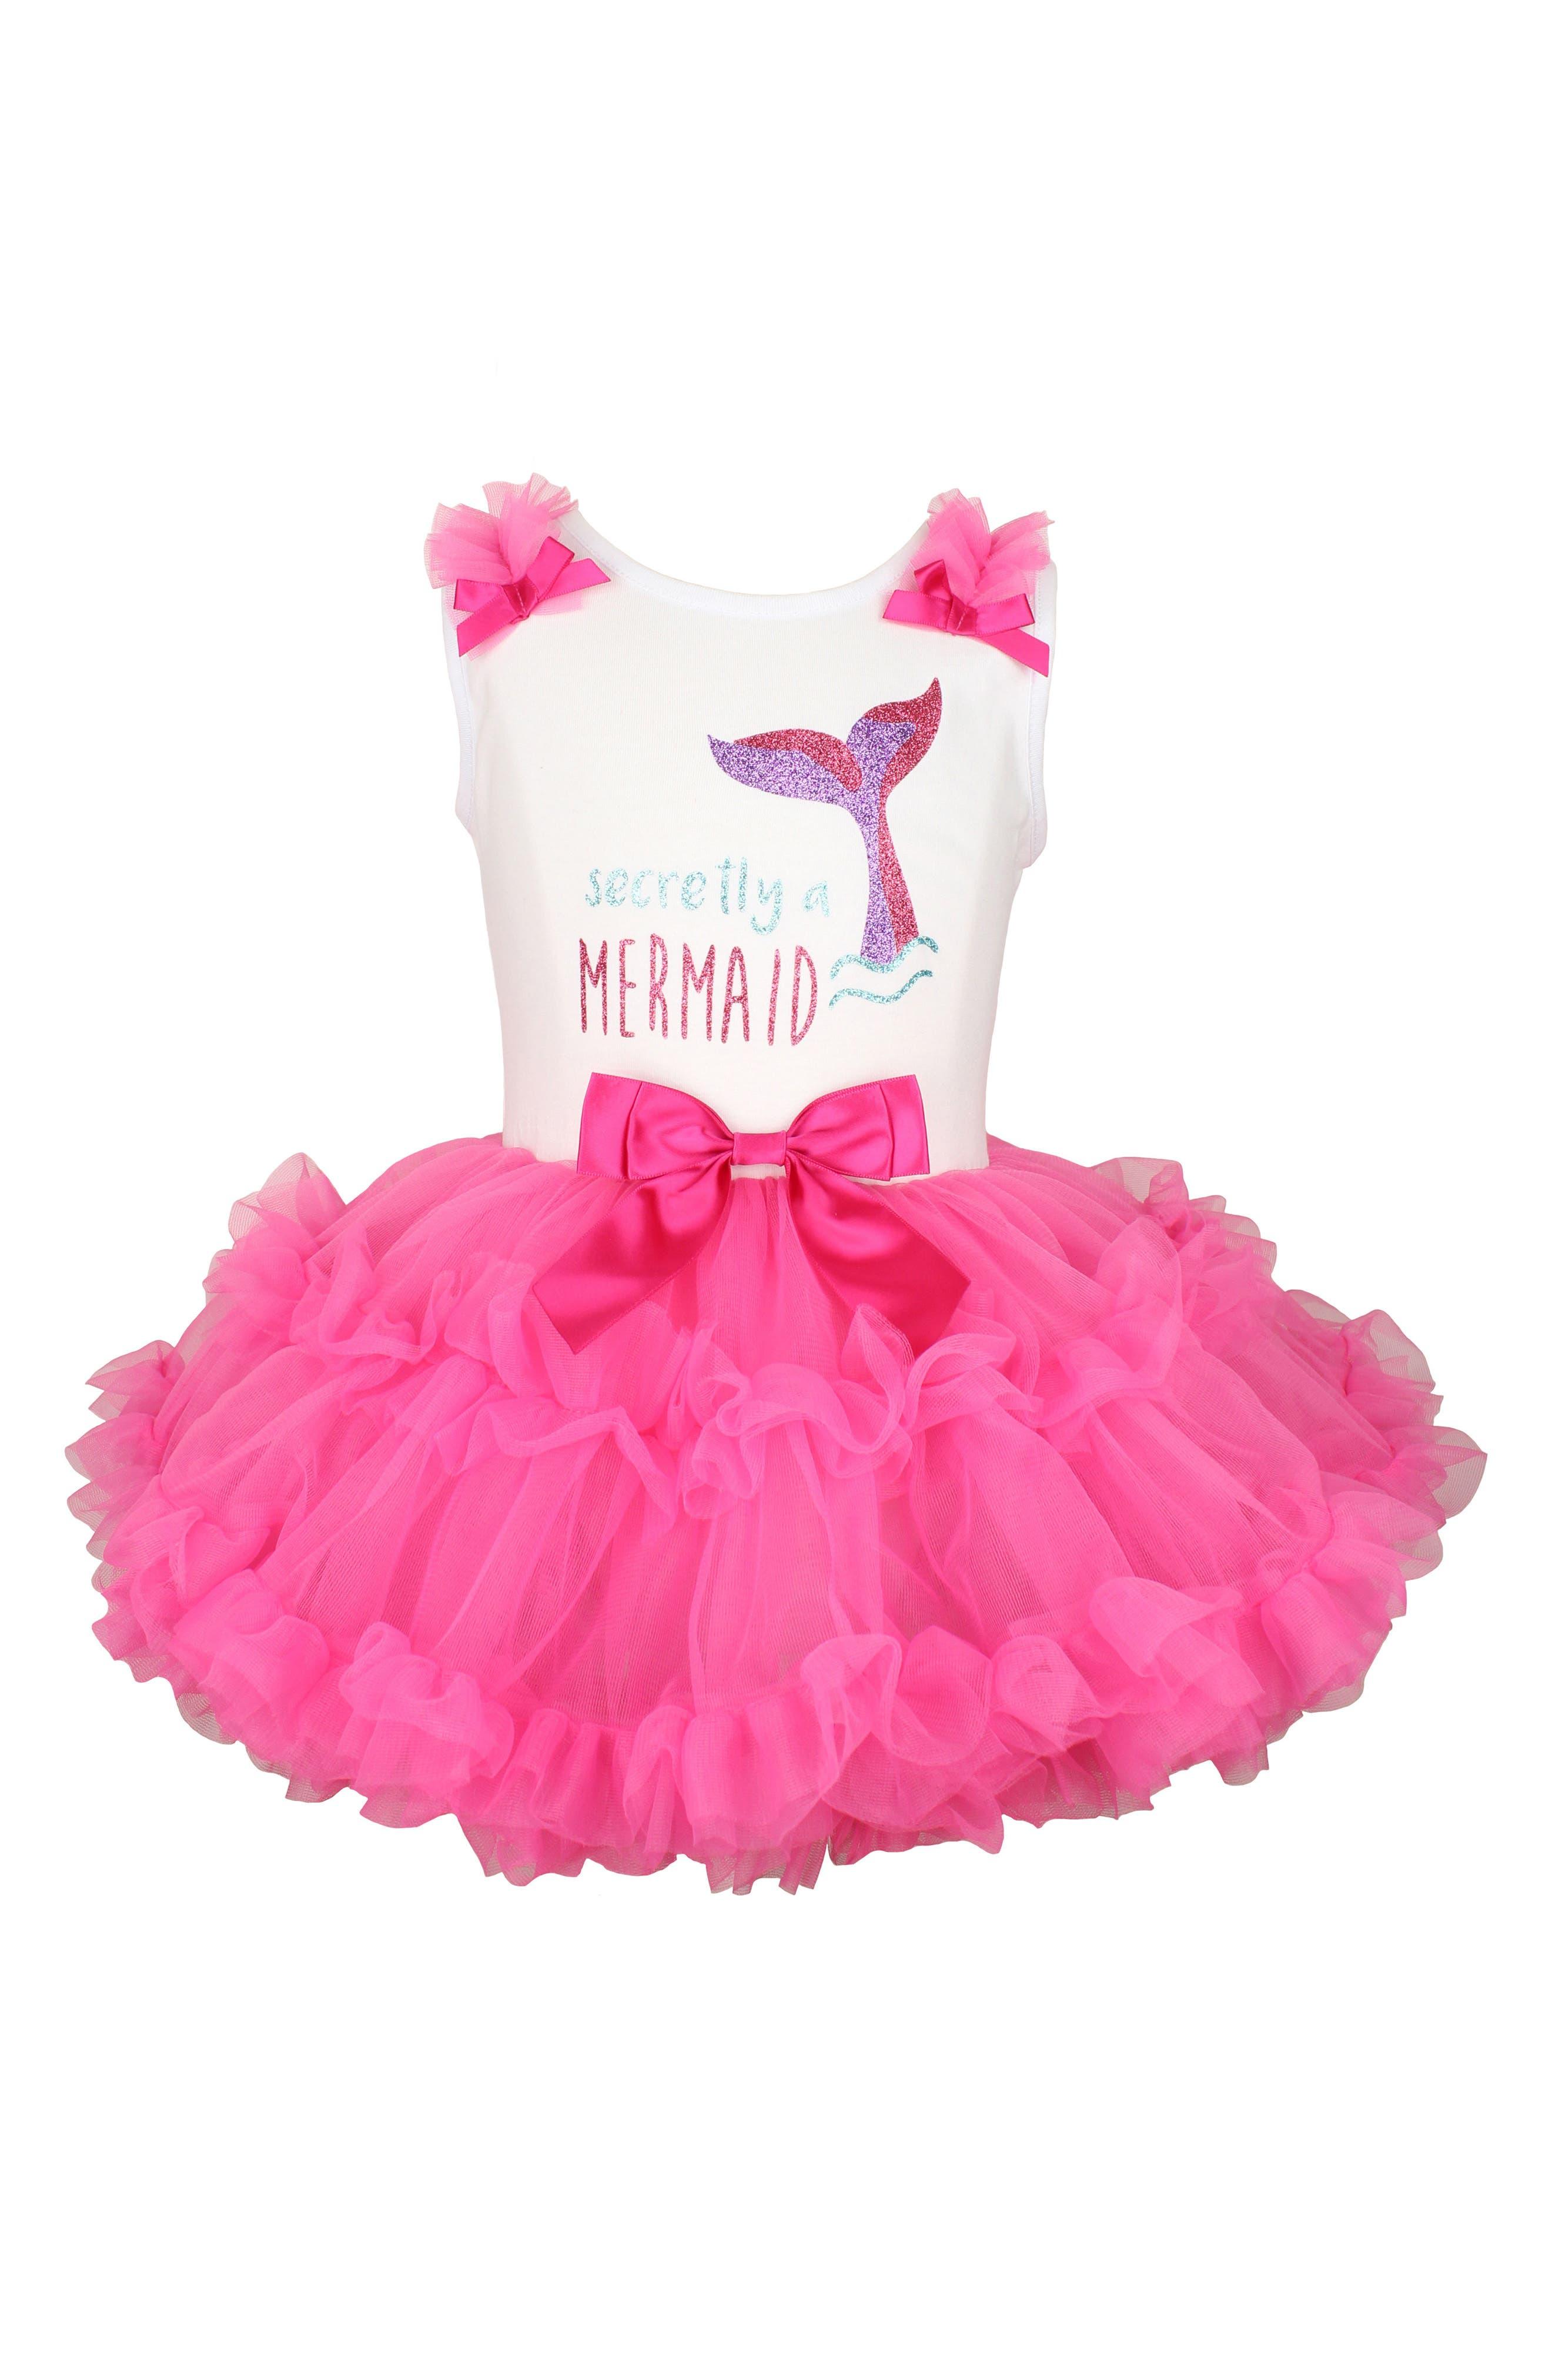 Secretly a Mermaid Sparkle Pettidress,                         Main,                         color, Hot Pink